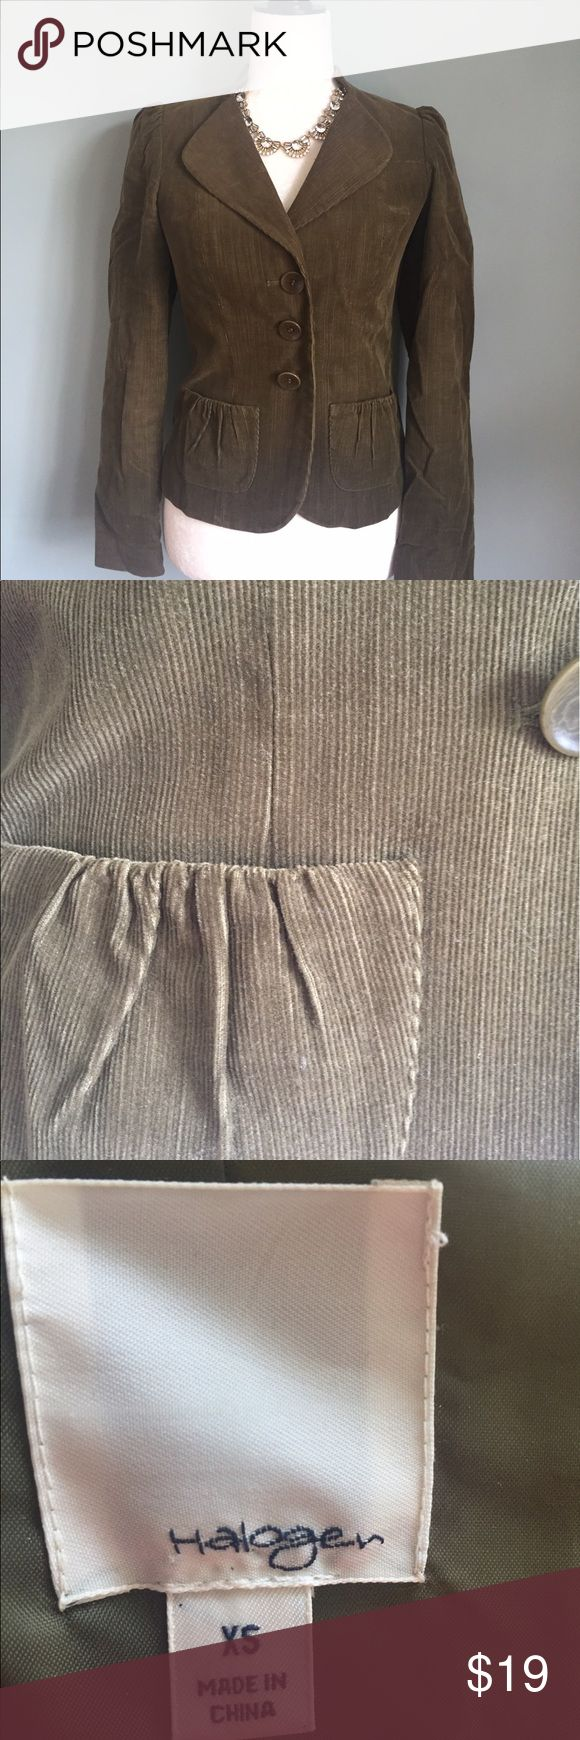 Olive green corduroy blazer Olive green blazer Halogen Jackets & Coats Blazers